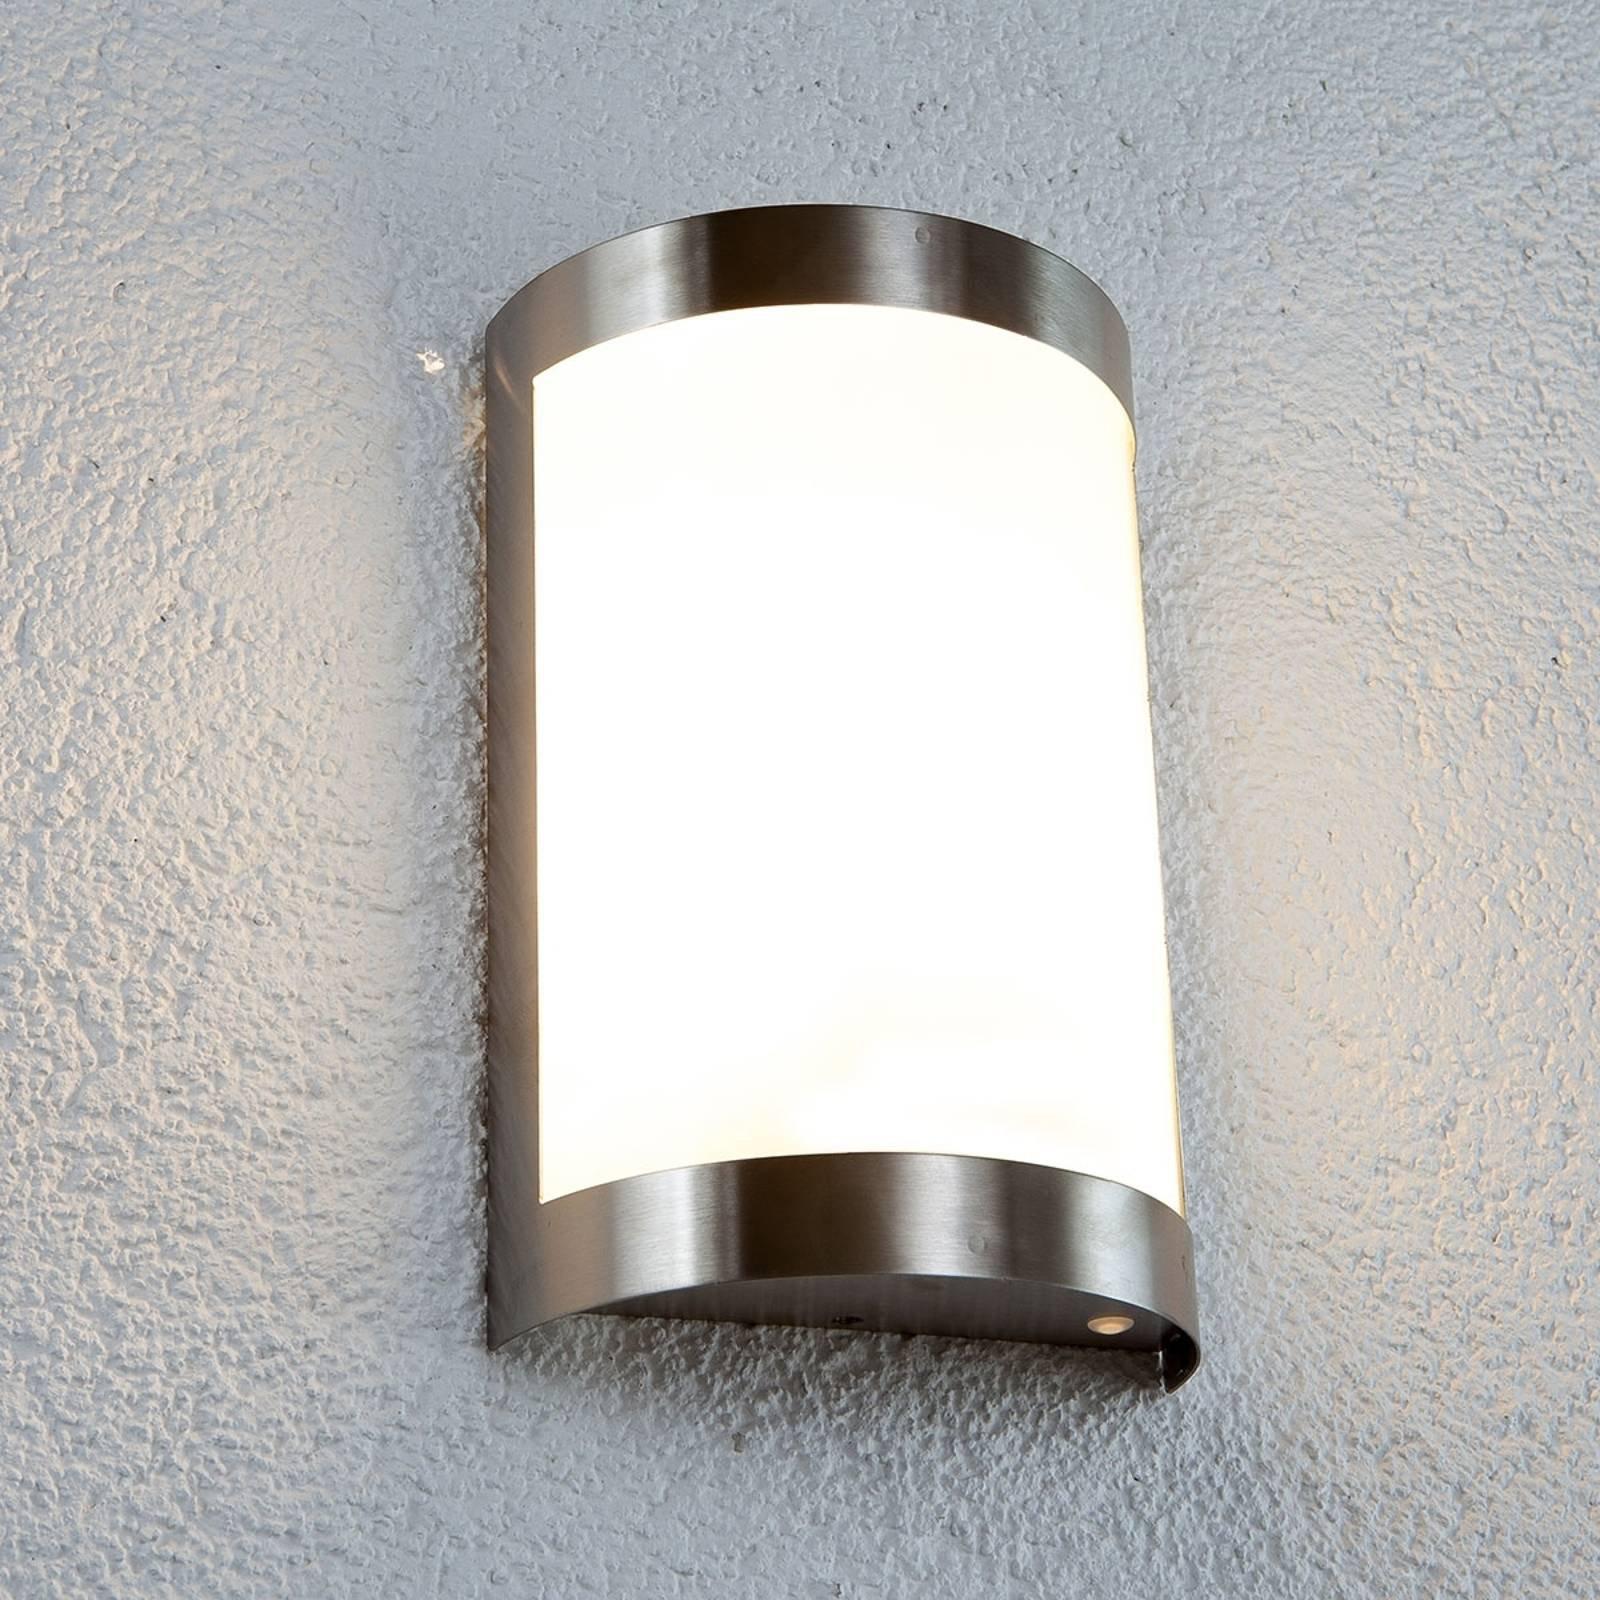 Vegglampe i rustfritt stål